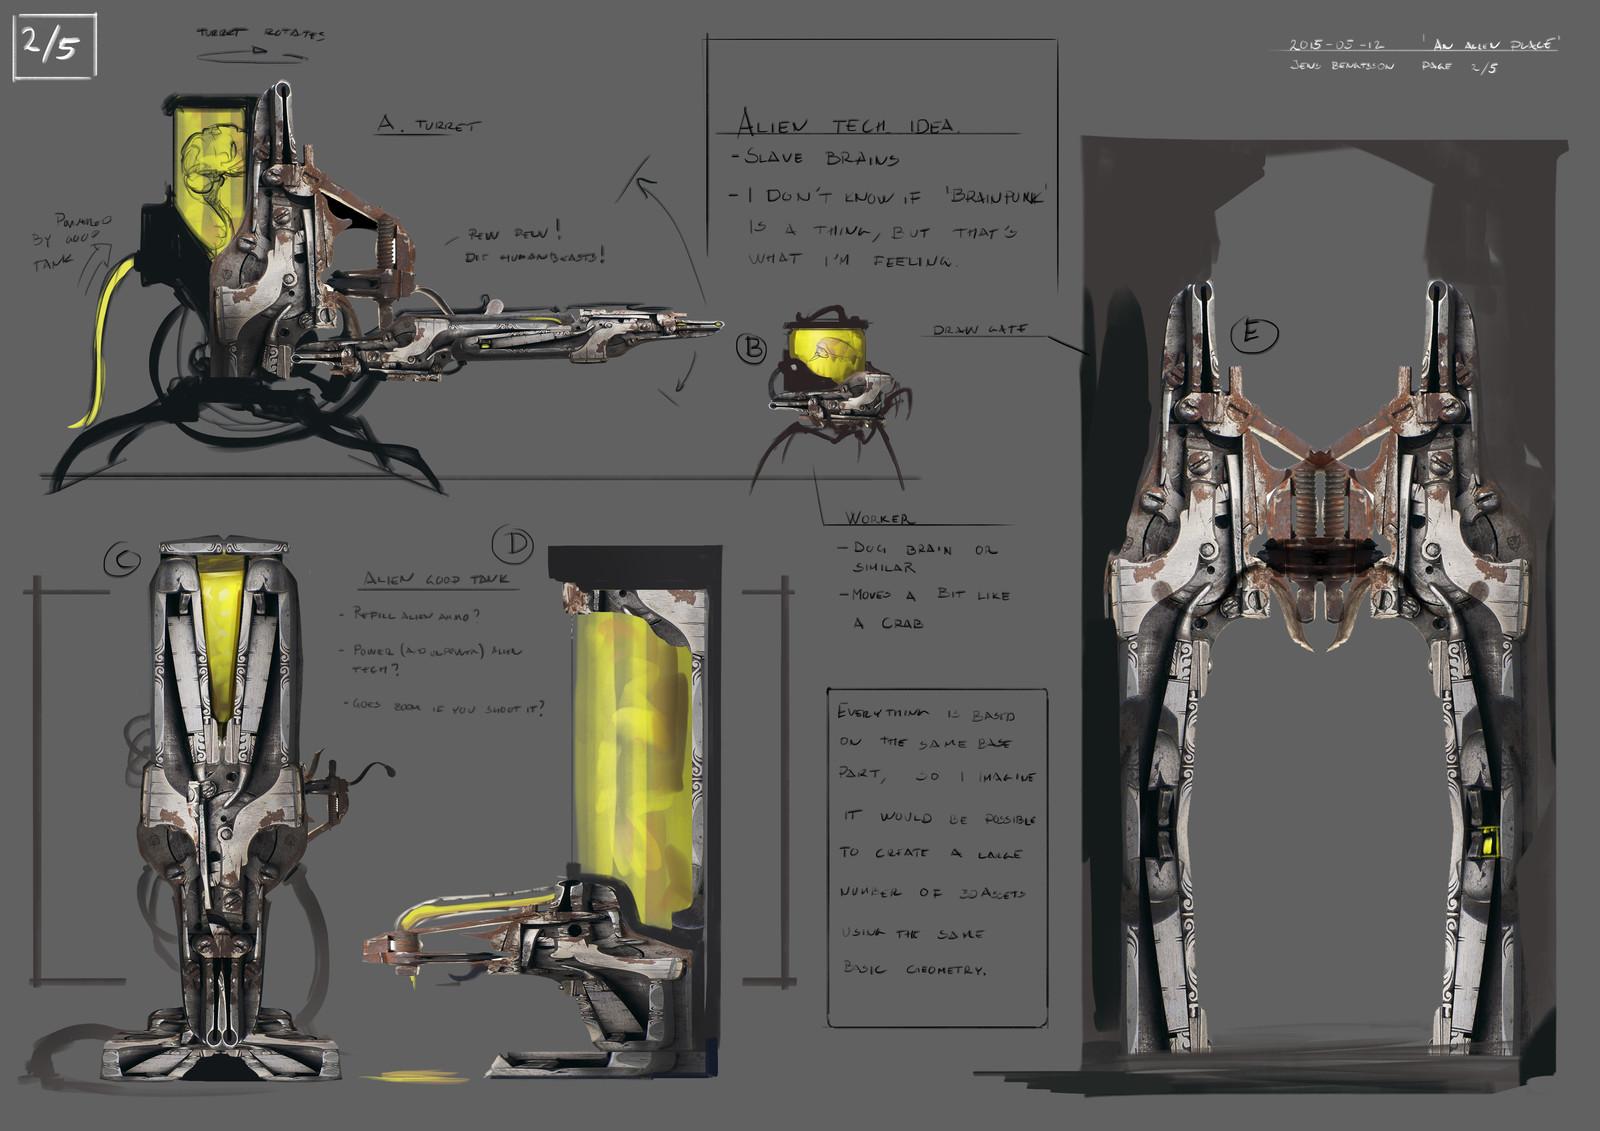 Developing the alien tech - brainpunk.